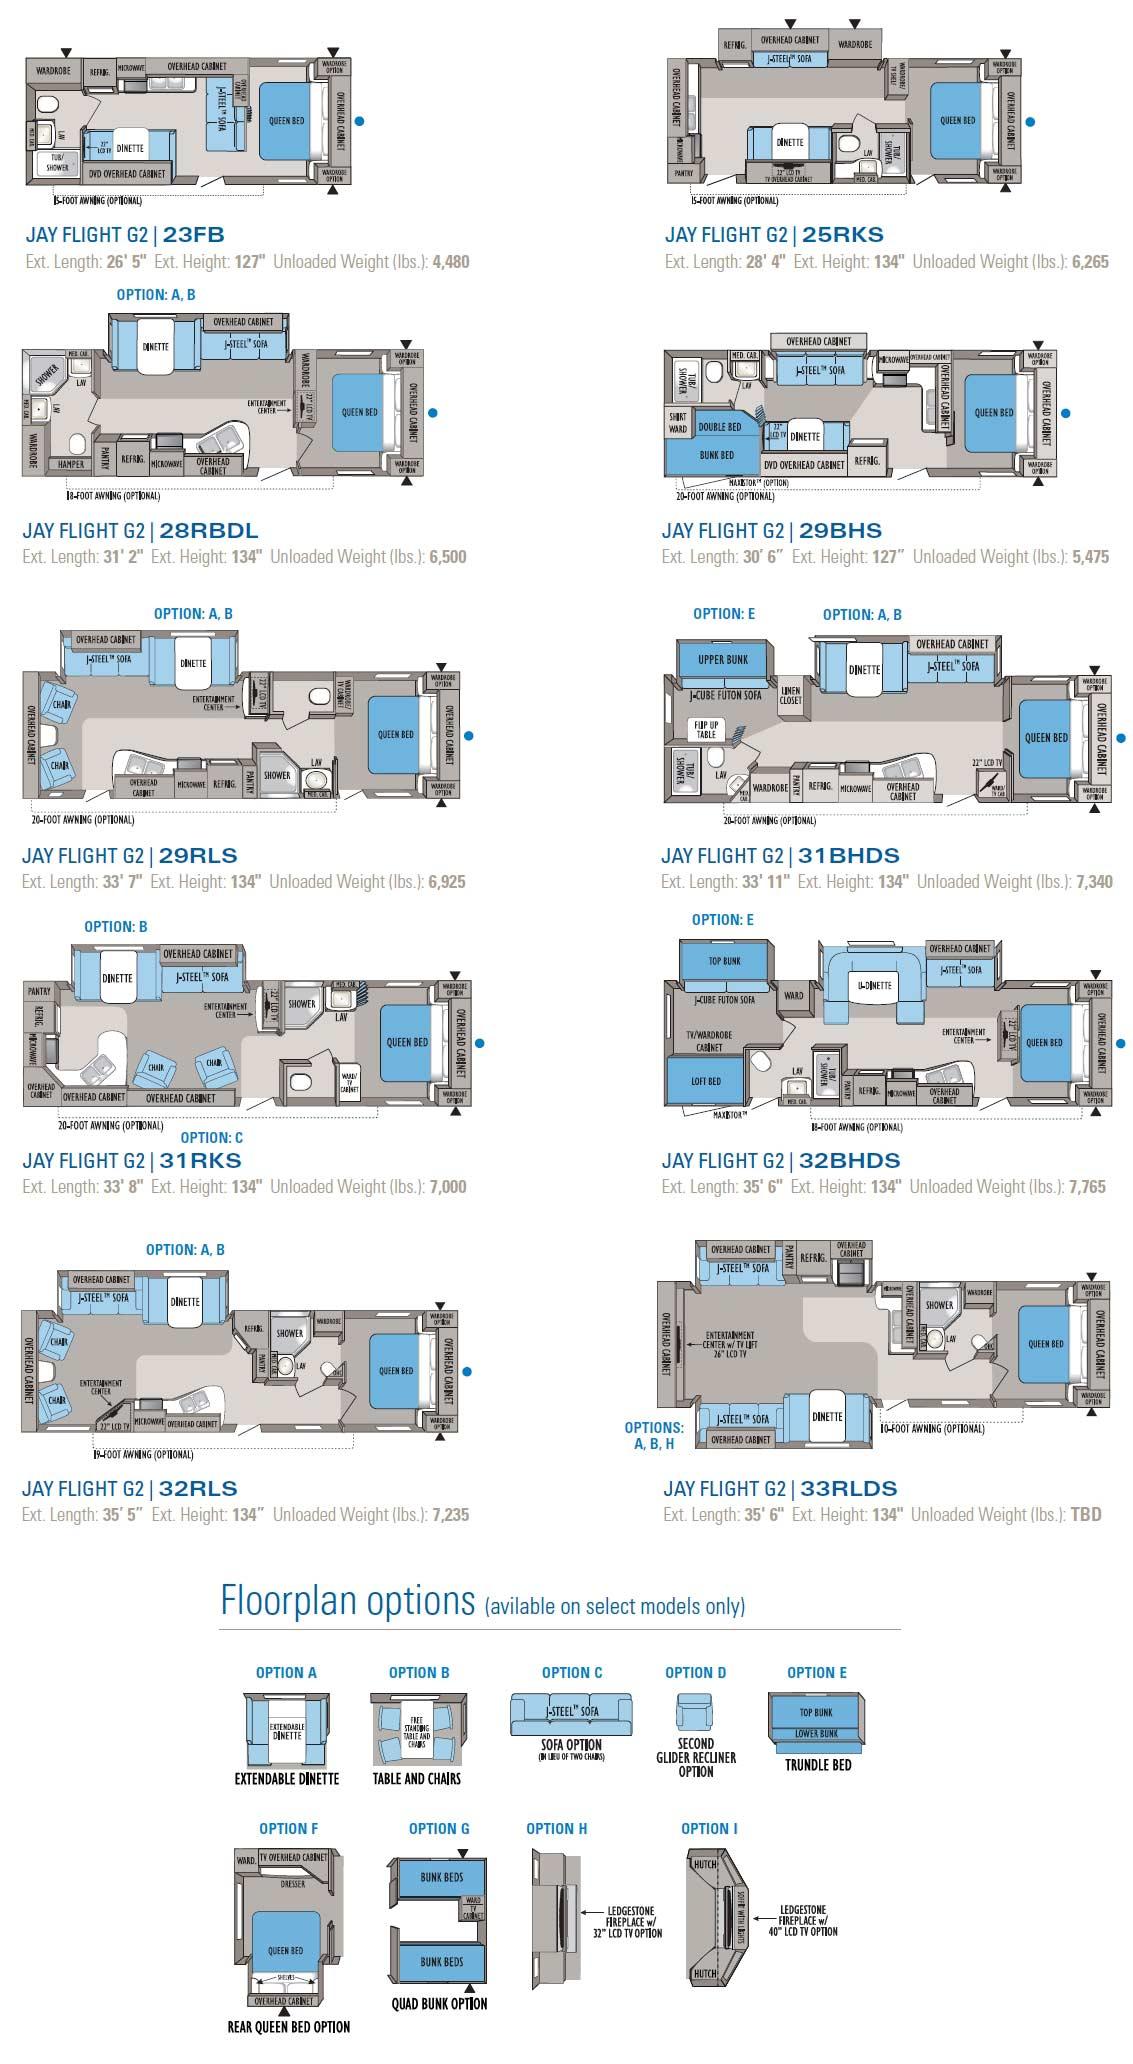 18 Wheeler 7 Way Trailer Plug Diagram Not Lossing Wiring Large 5th Wheel Travel Truck 4